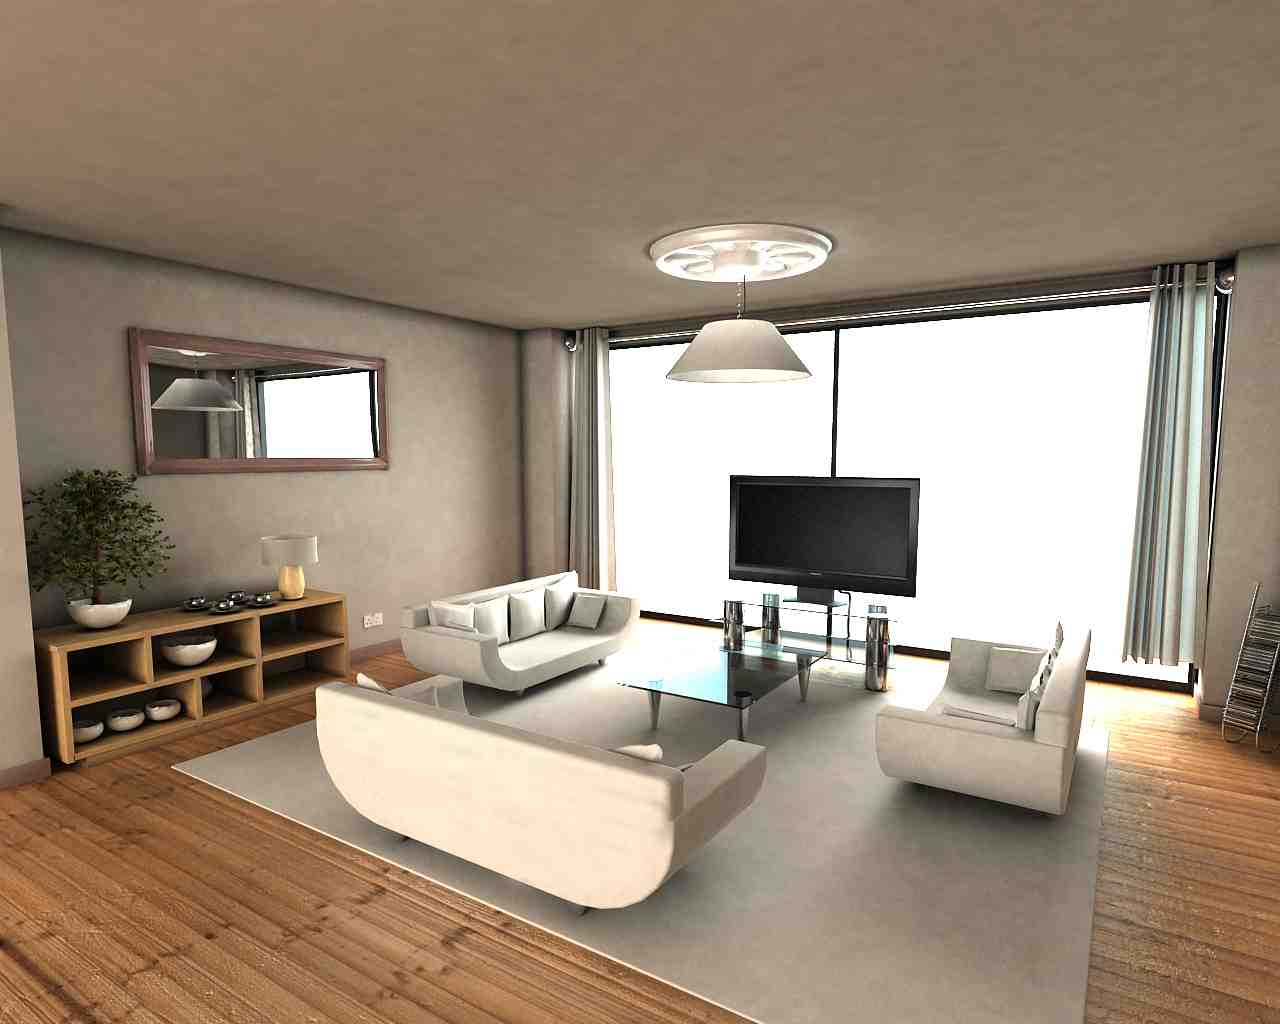 Apartment Decorating Ideas for Men - Decor Ideas